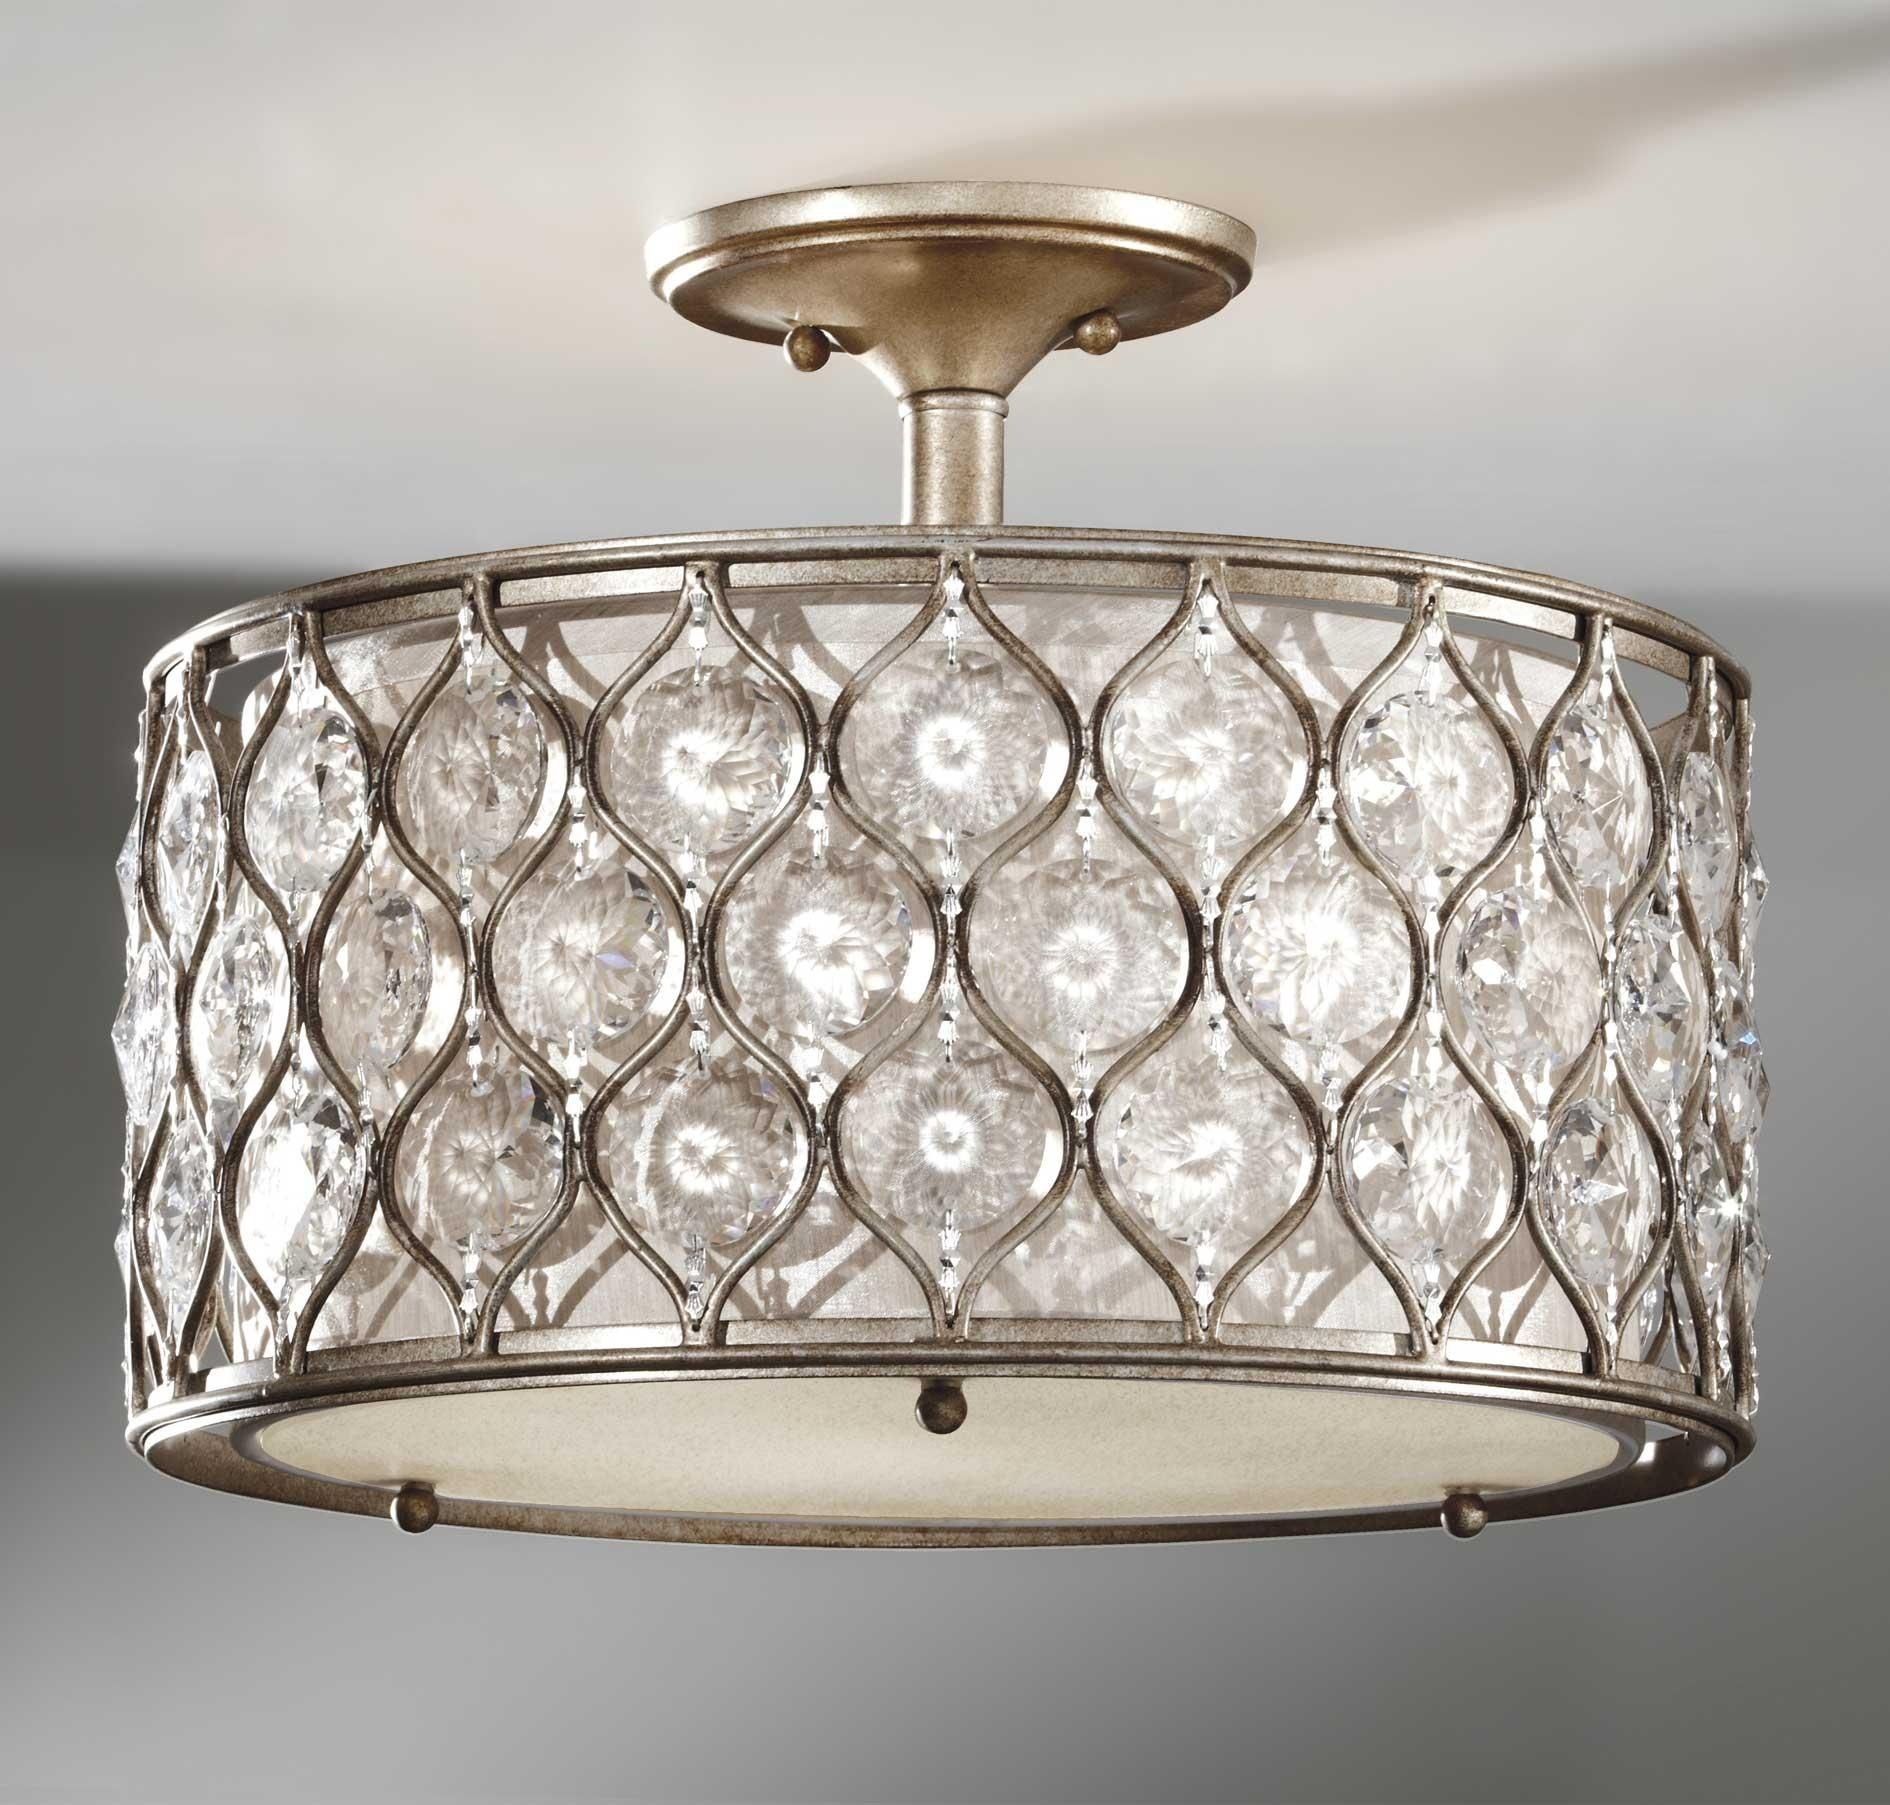 co tulum ceilings outdoor ceiling flush smsender lights mount